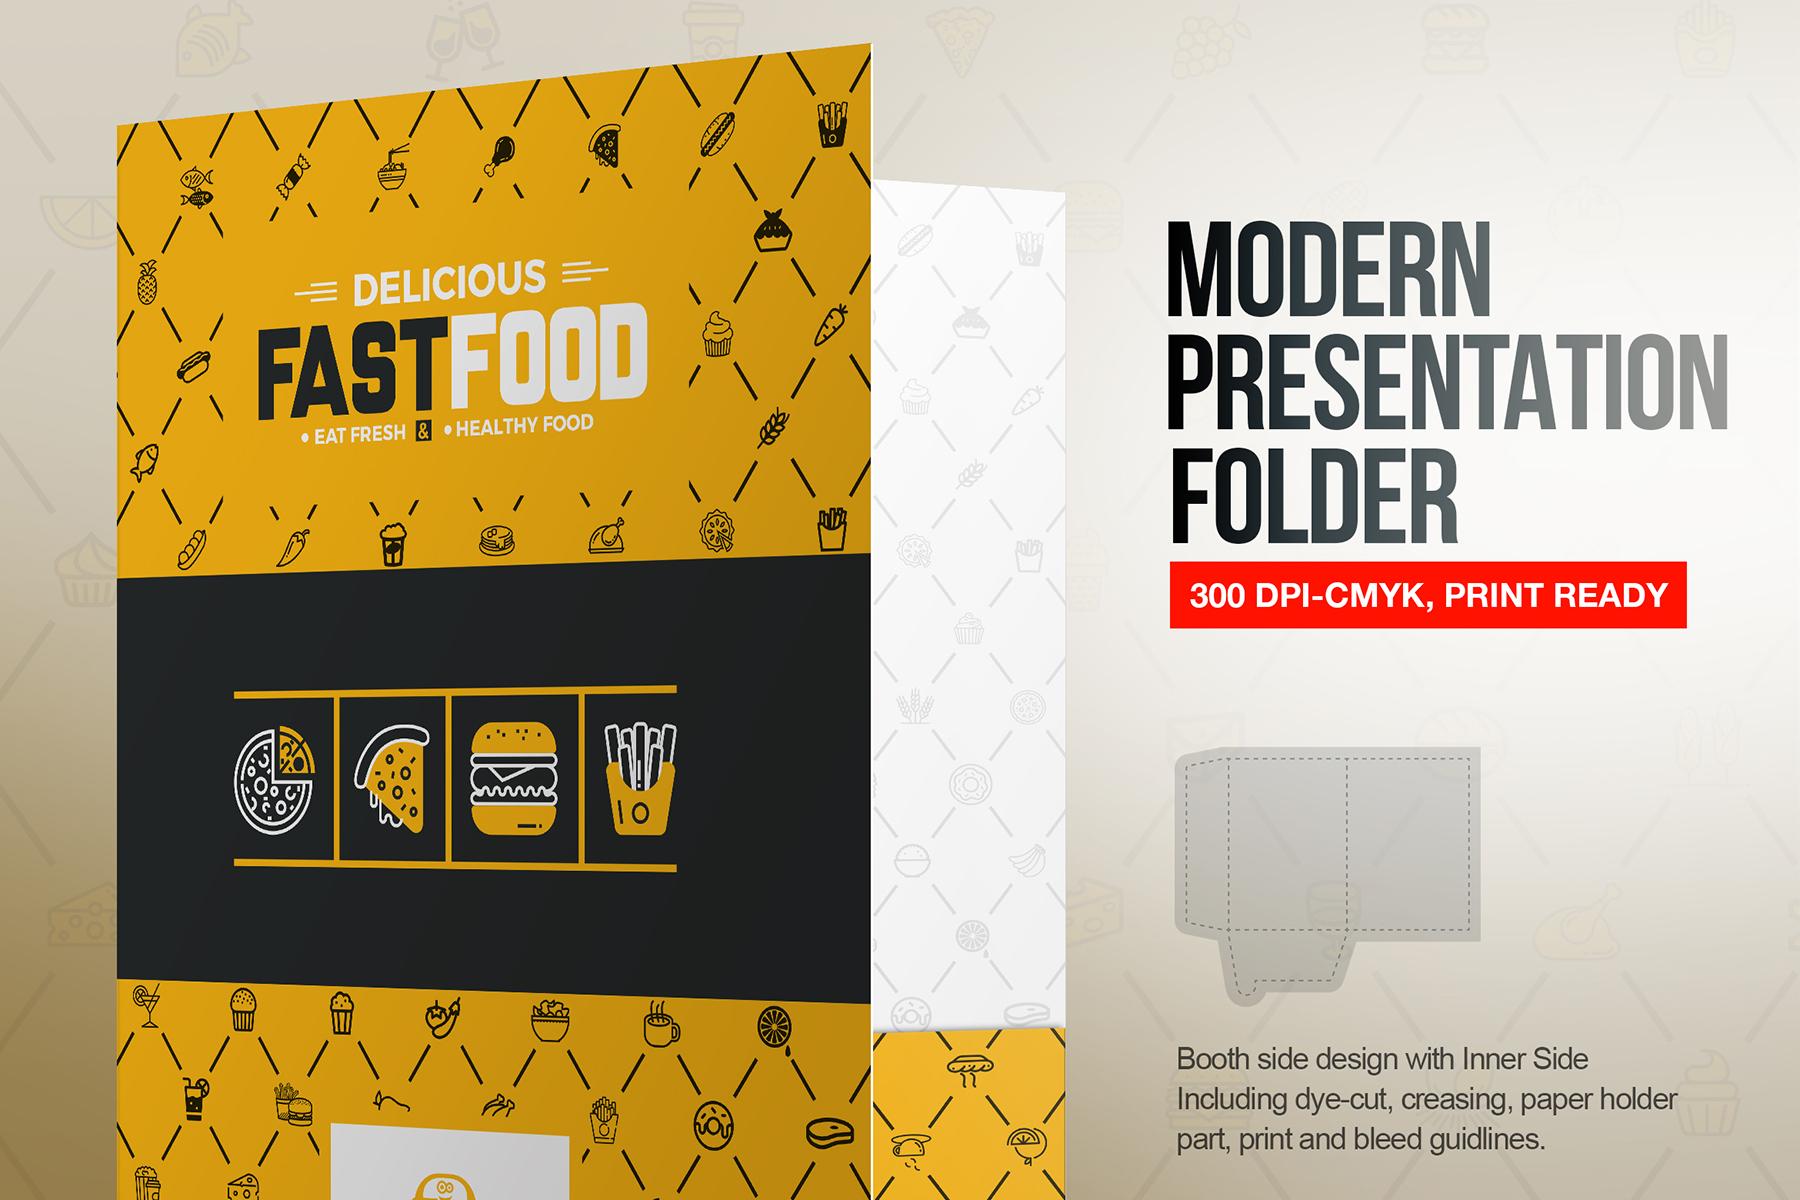 Presentation Folder With Pocket Template Document Holder - Fresh virtual museum template design